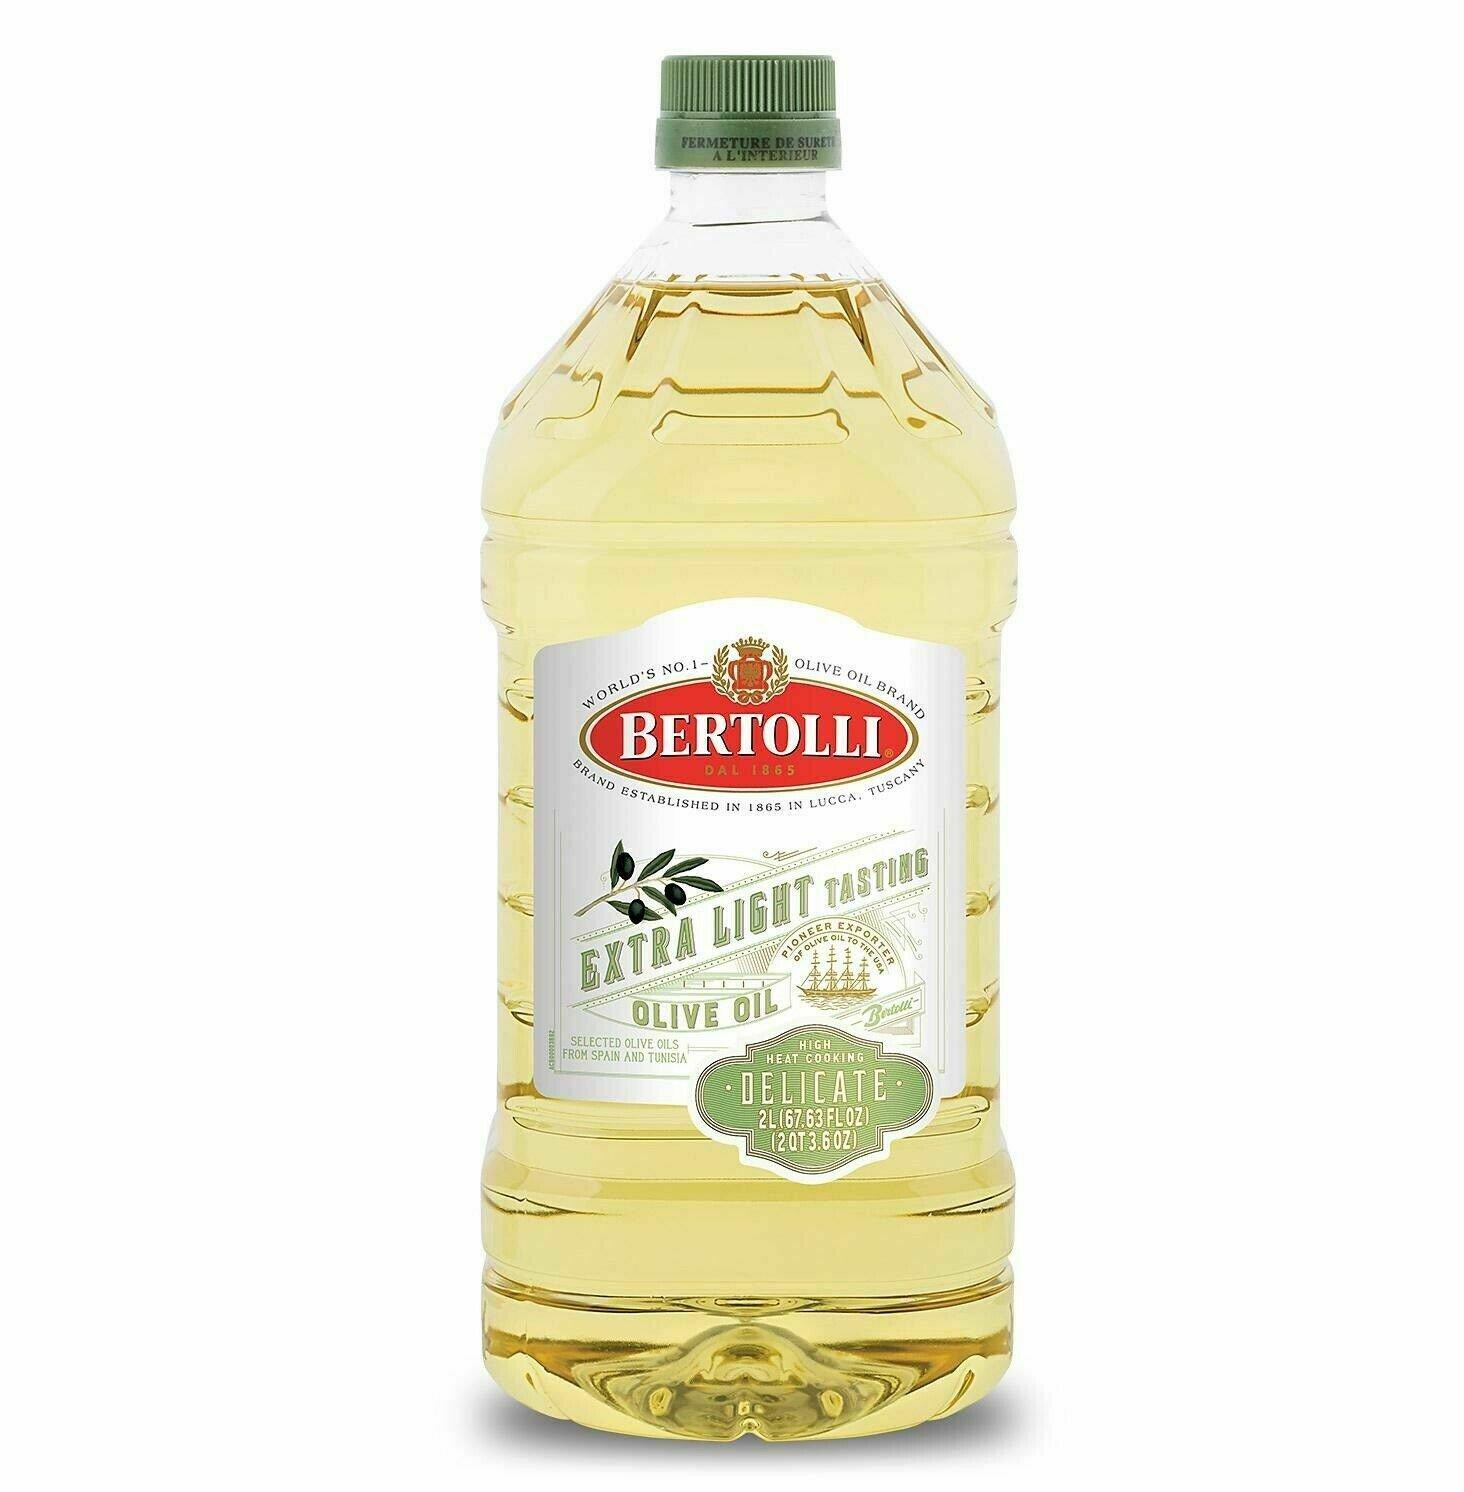 Bertolli Delicate Extra Light Olive Oil 2 liters/ 68 oz